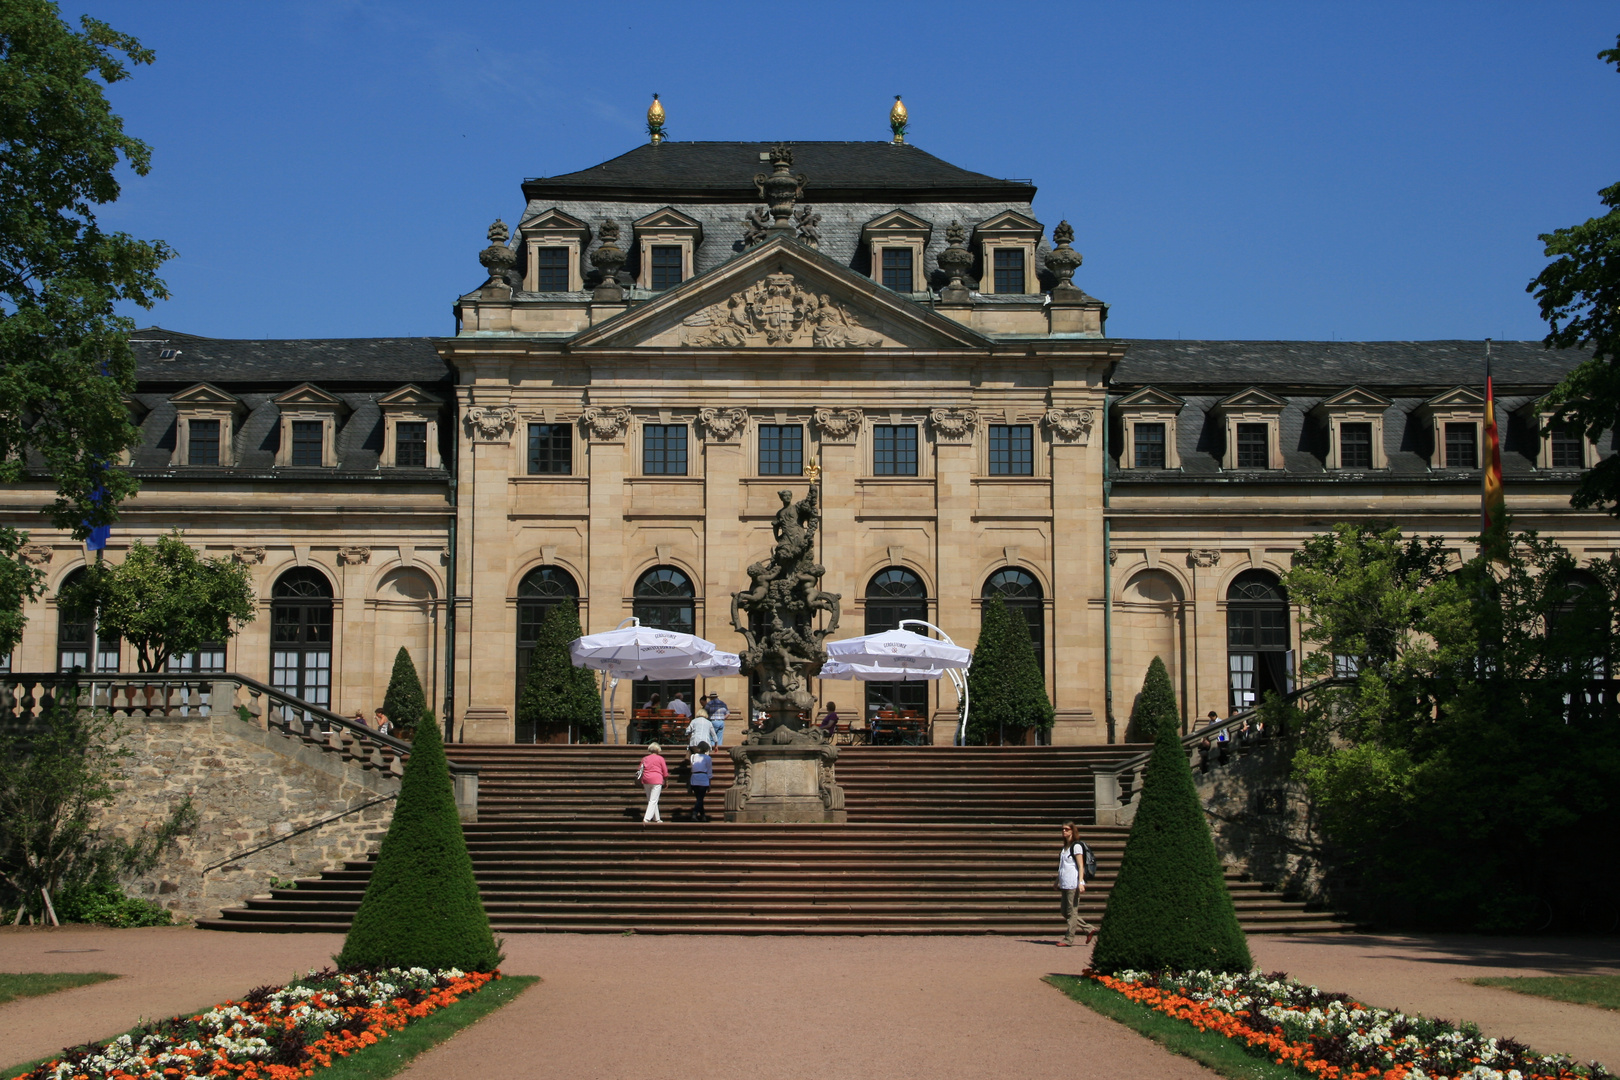 Orangerie im Fuldaer Schlossgarten